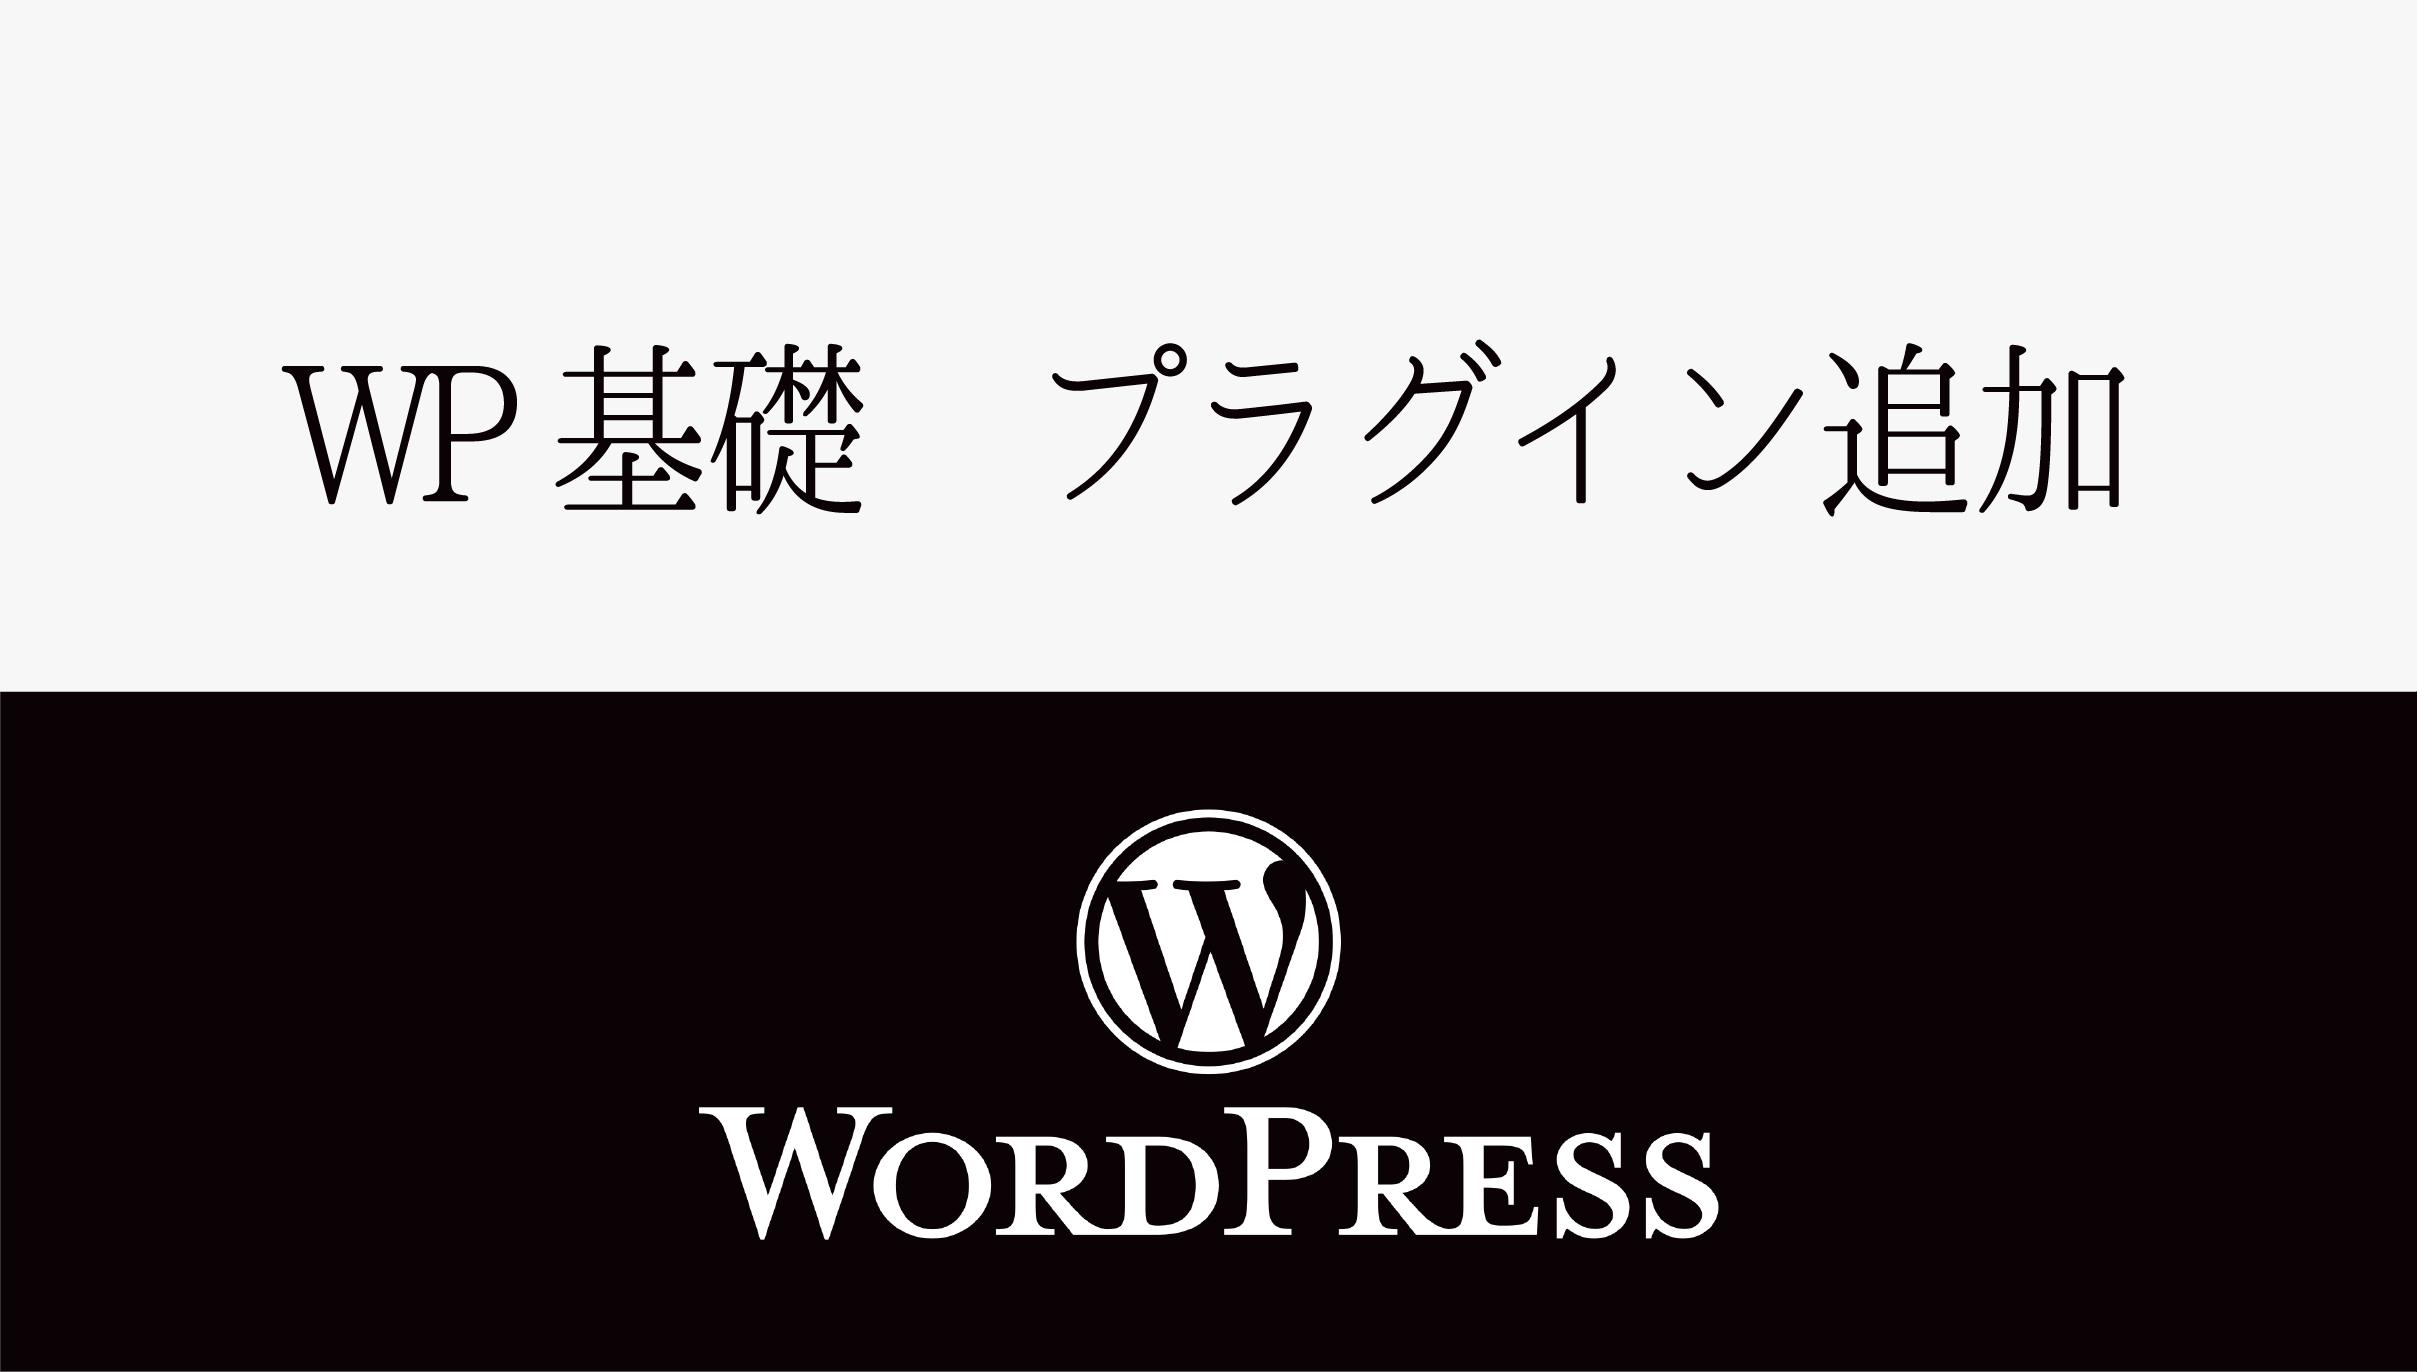 【WP基礎】ワードプレスのプラグインの追加方法!ファイルインストールと検索インストール